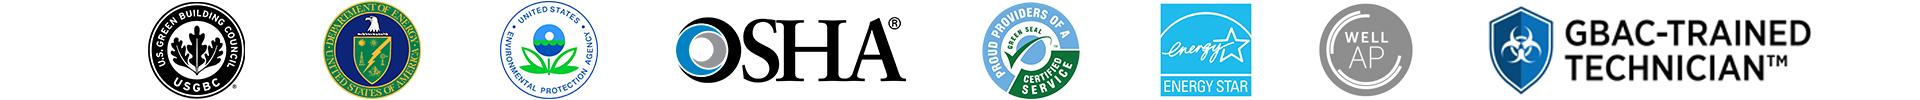 Janitorial Logos Footer v2